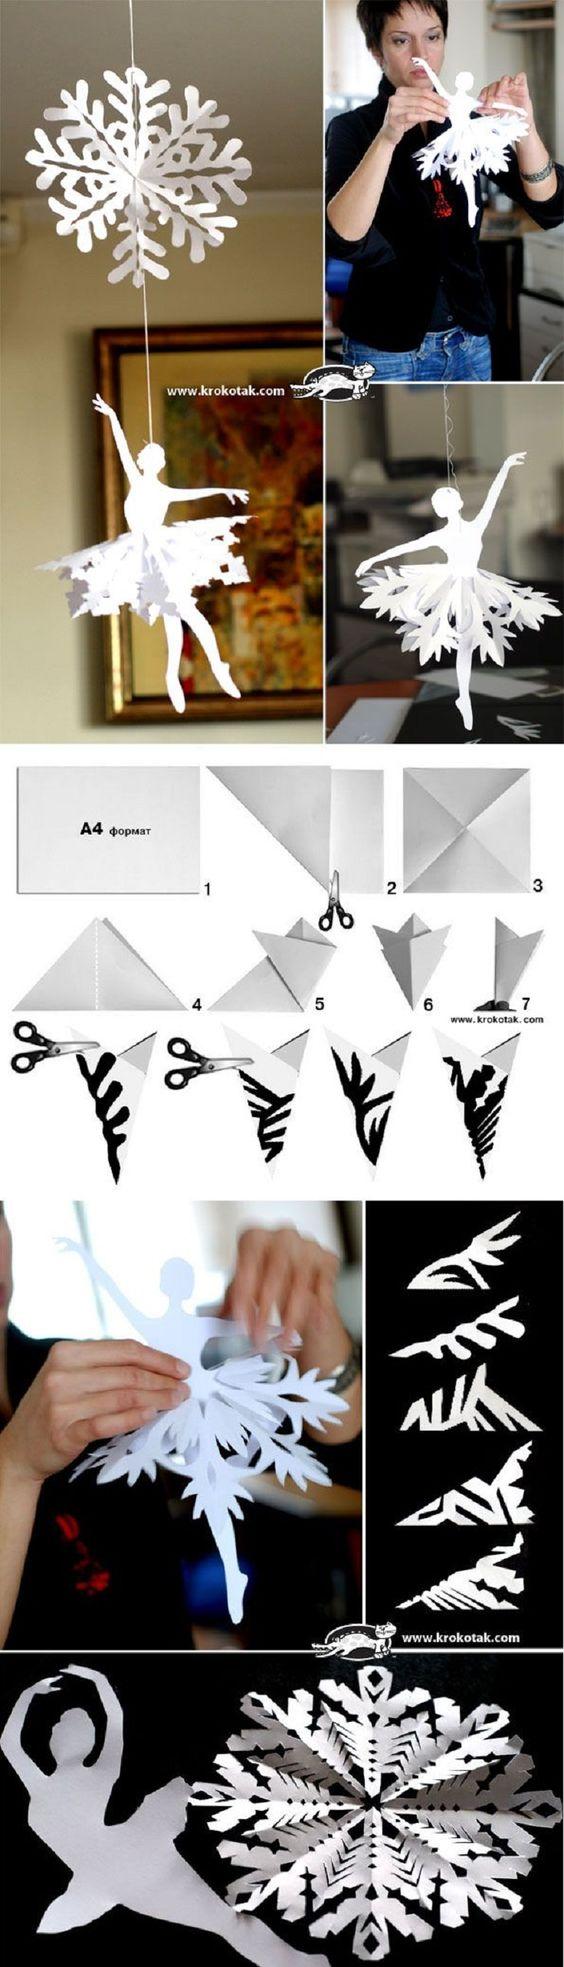 DIY Ballerinas Snowflakes - 16 Winter Wonderland DIY Paper Decorations: